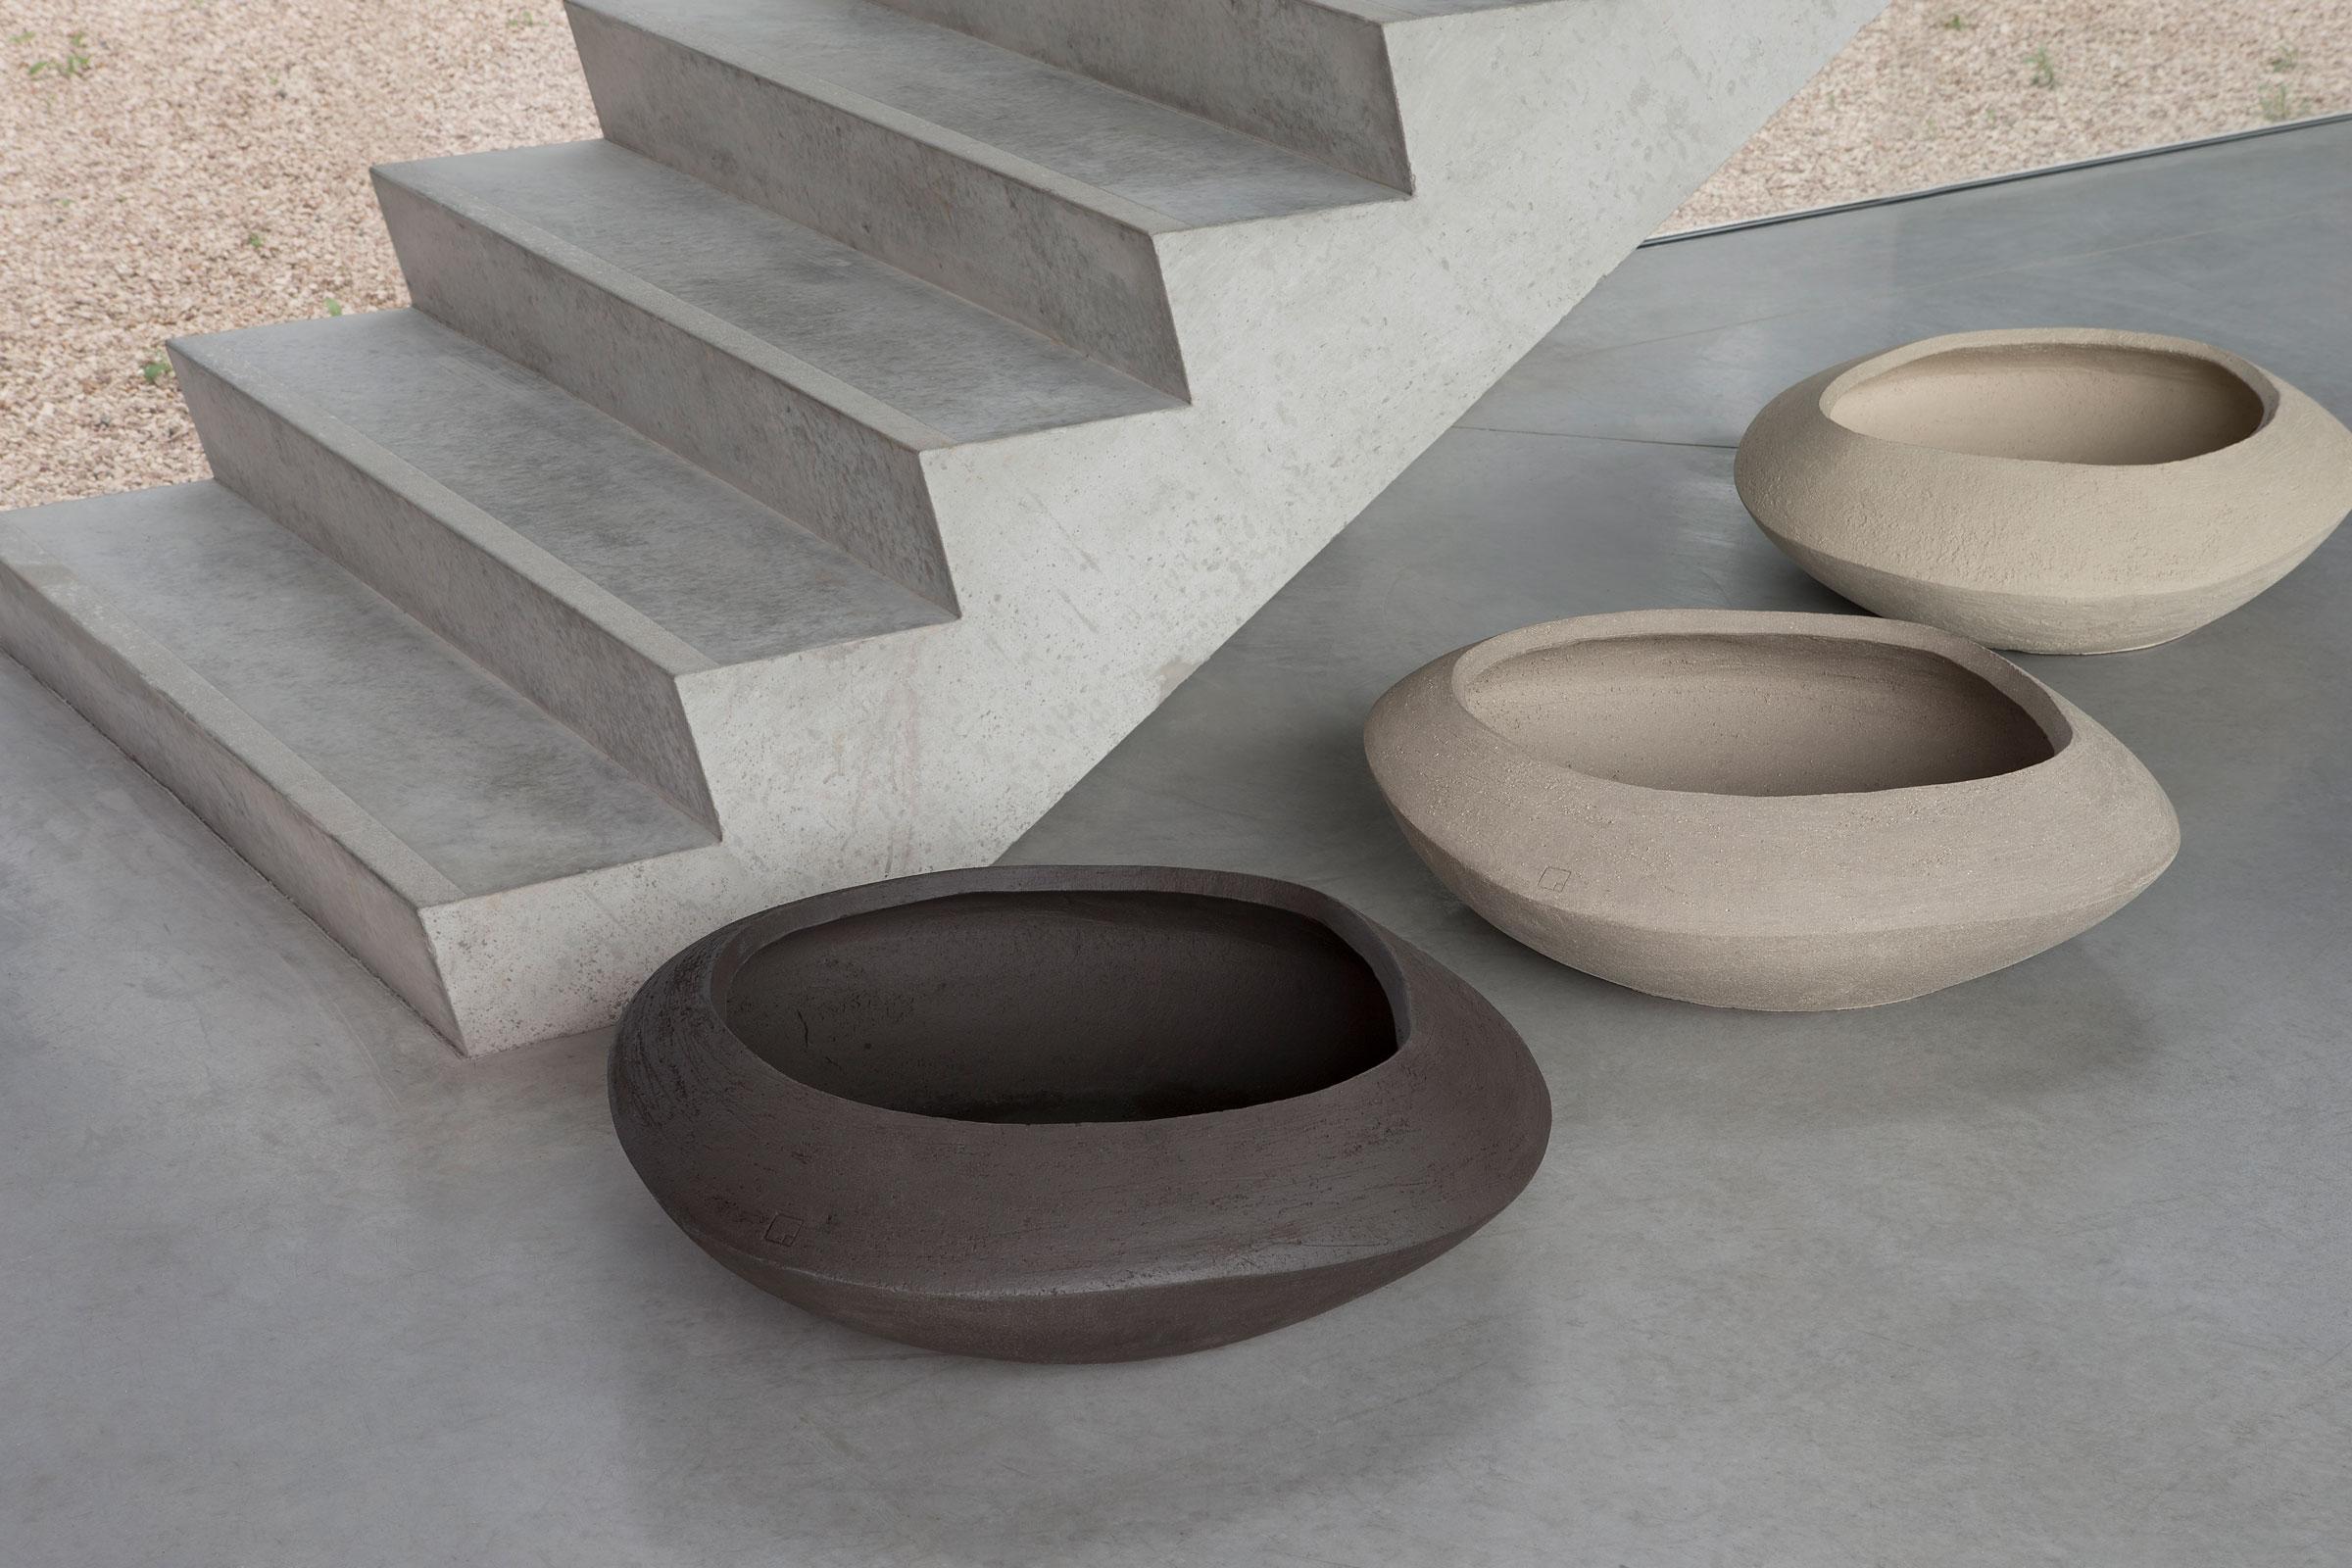 hauser-design-atelier-vierkant-schalen